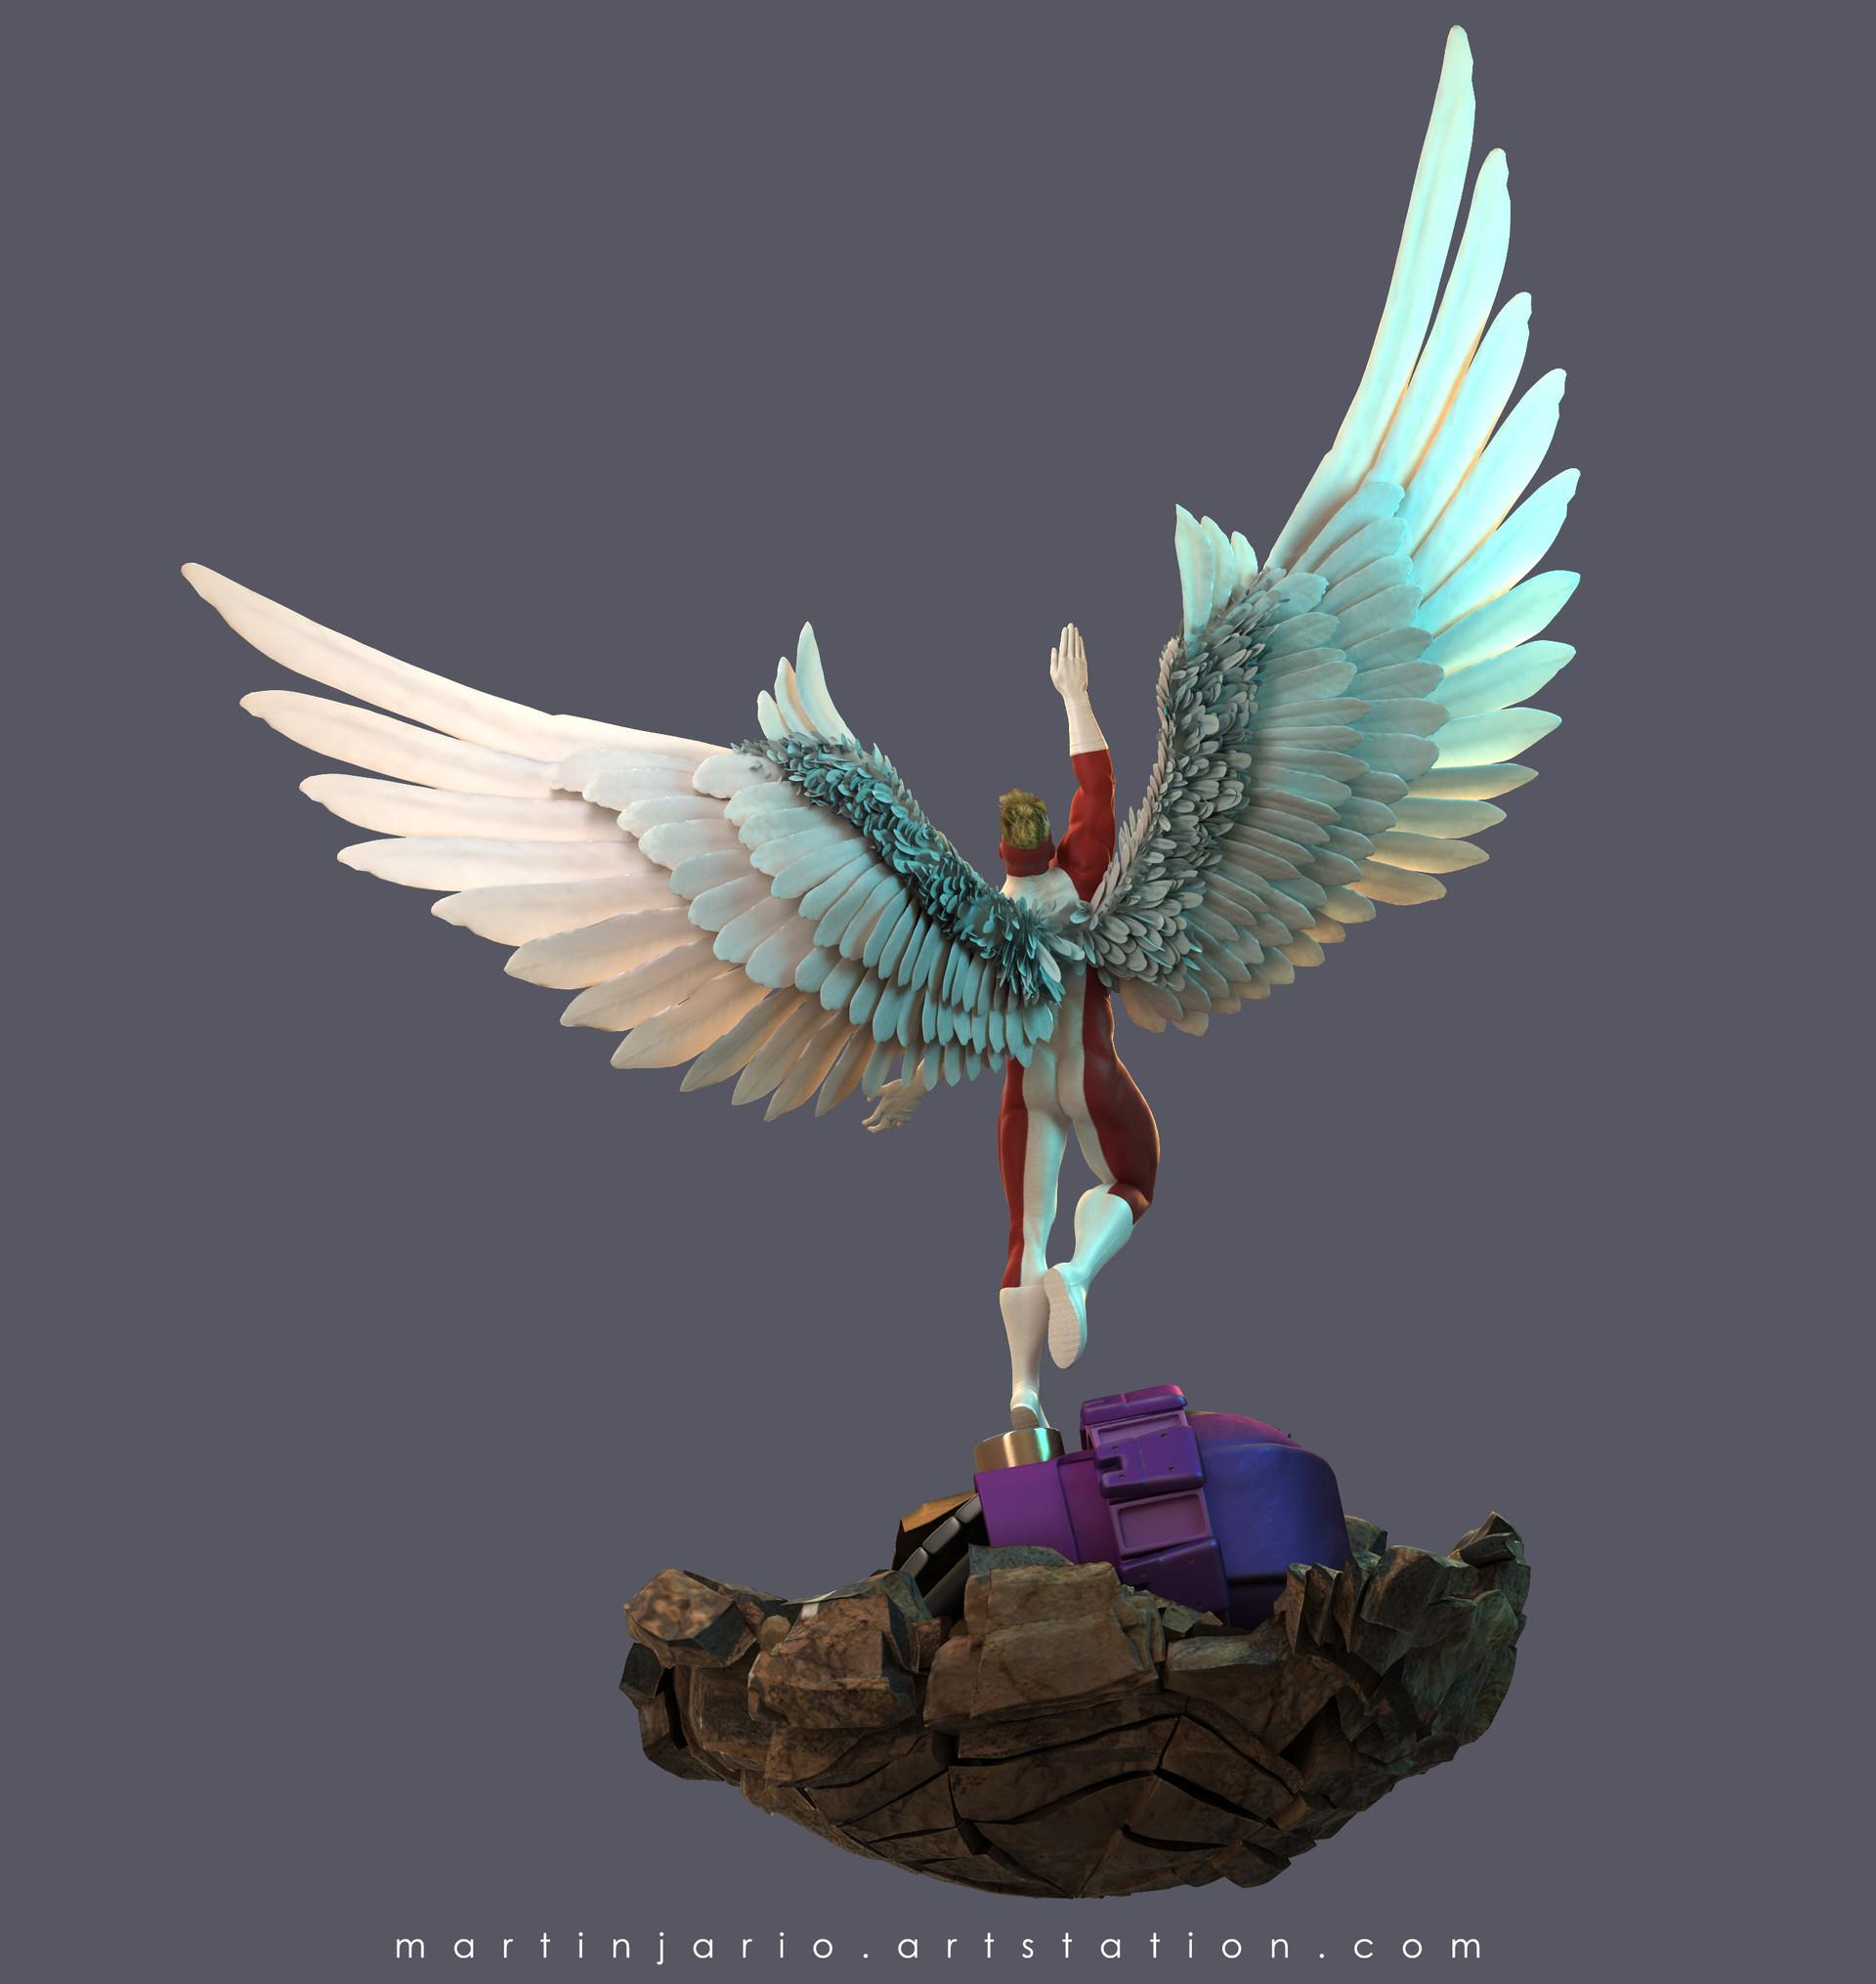 Martin jario martinjario angel artstation 01